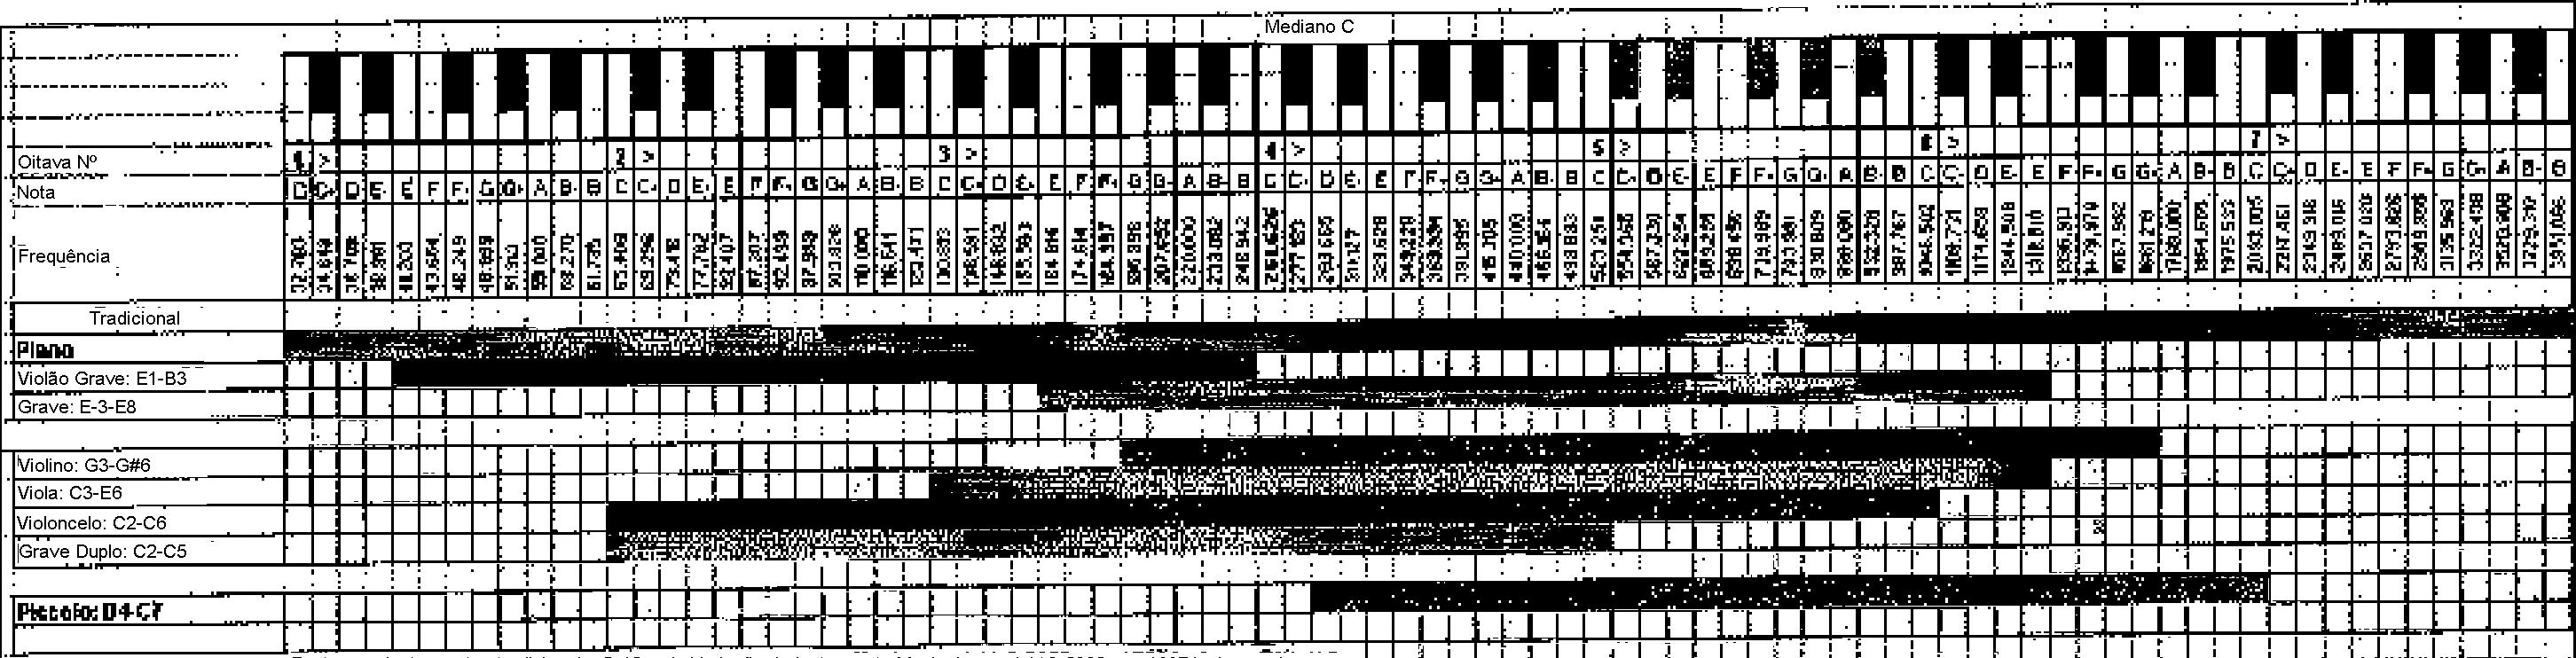 Figure BRPI0708539B1_D0002